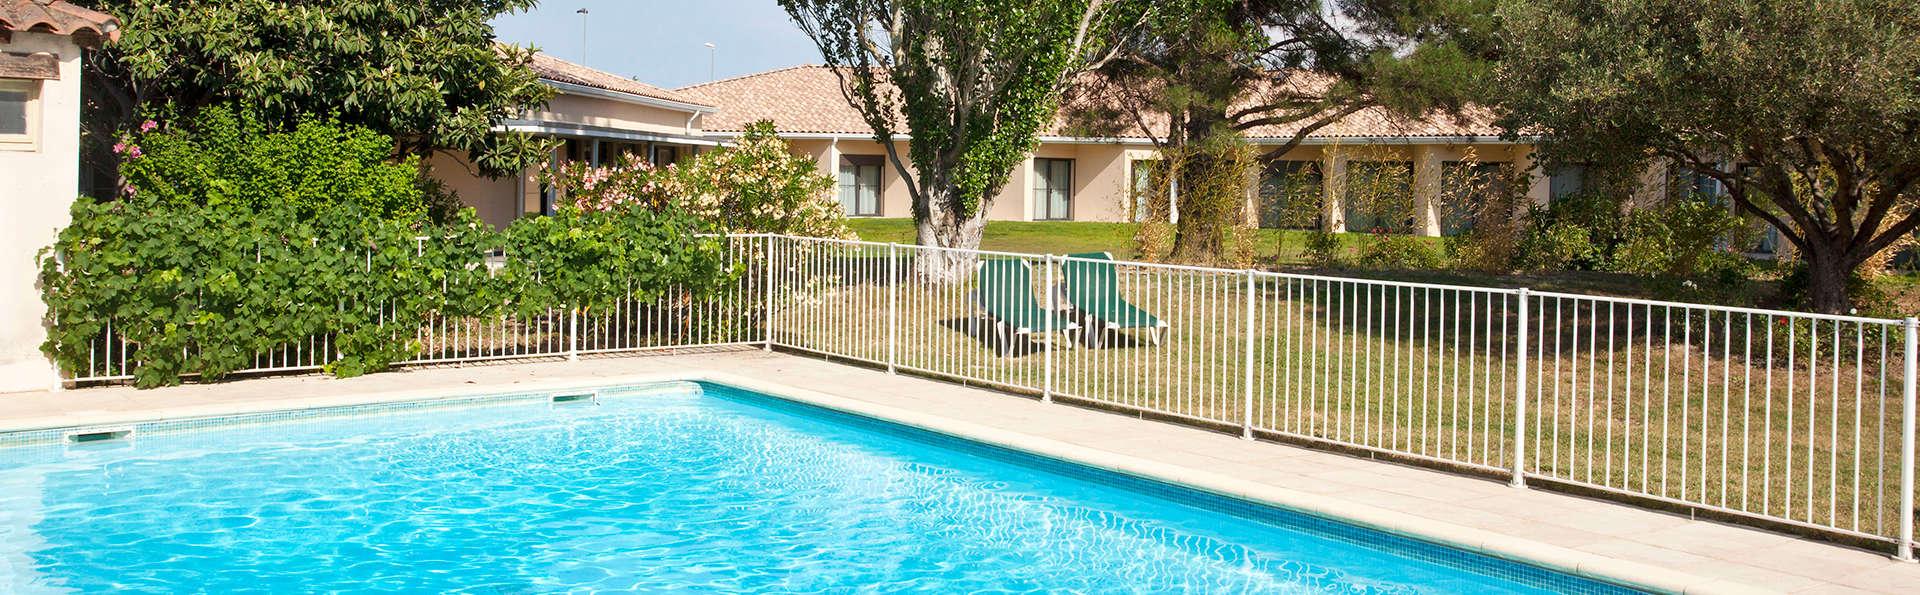 BEST WESTERN Hôtel Le Paradou Avignon Sud - EDIT_pool.jpg